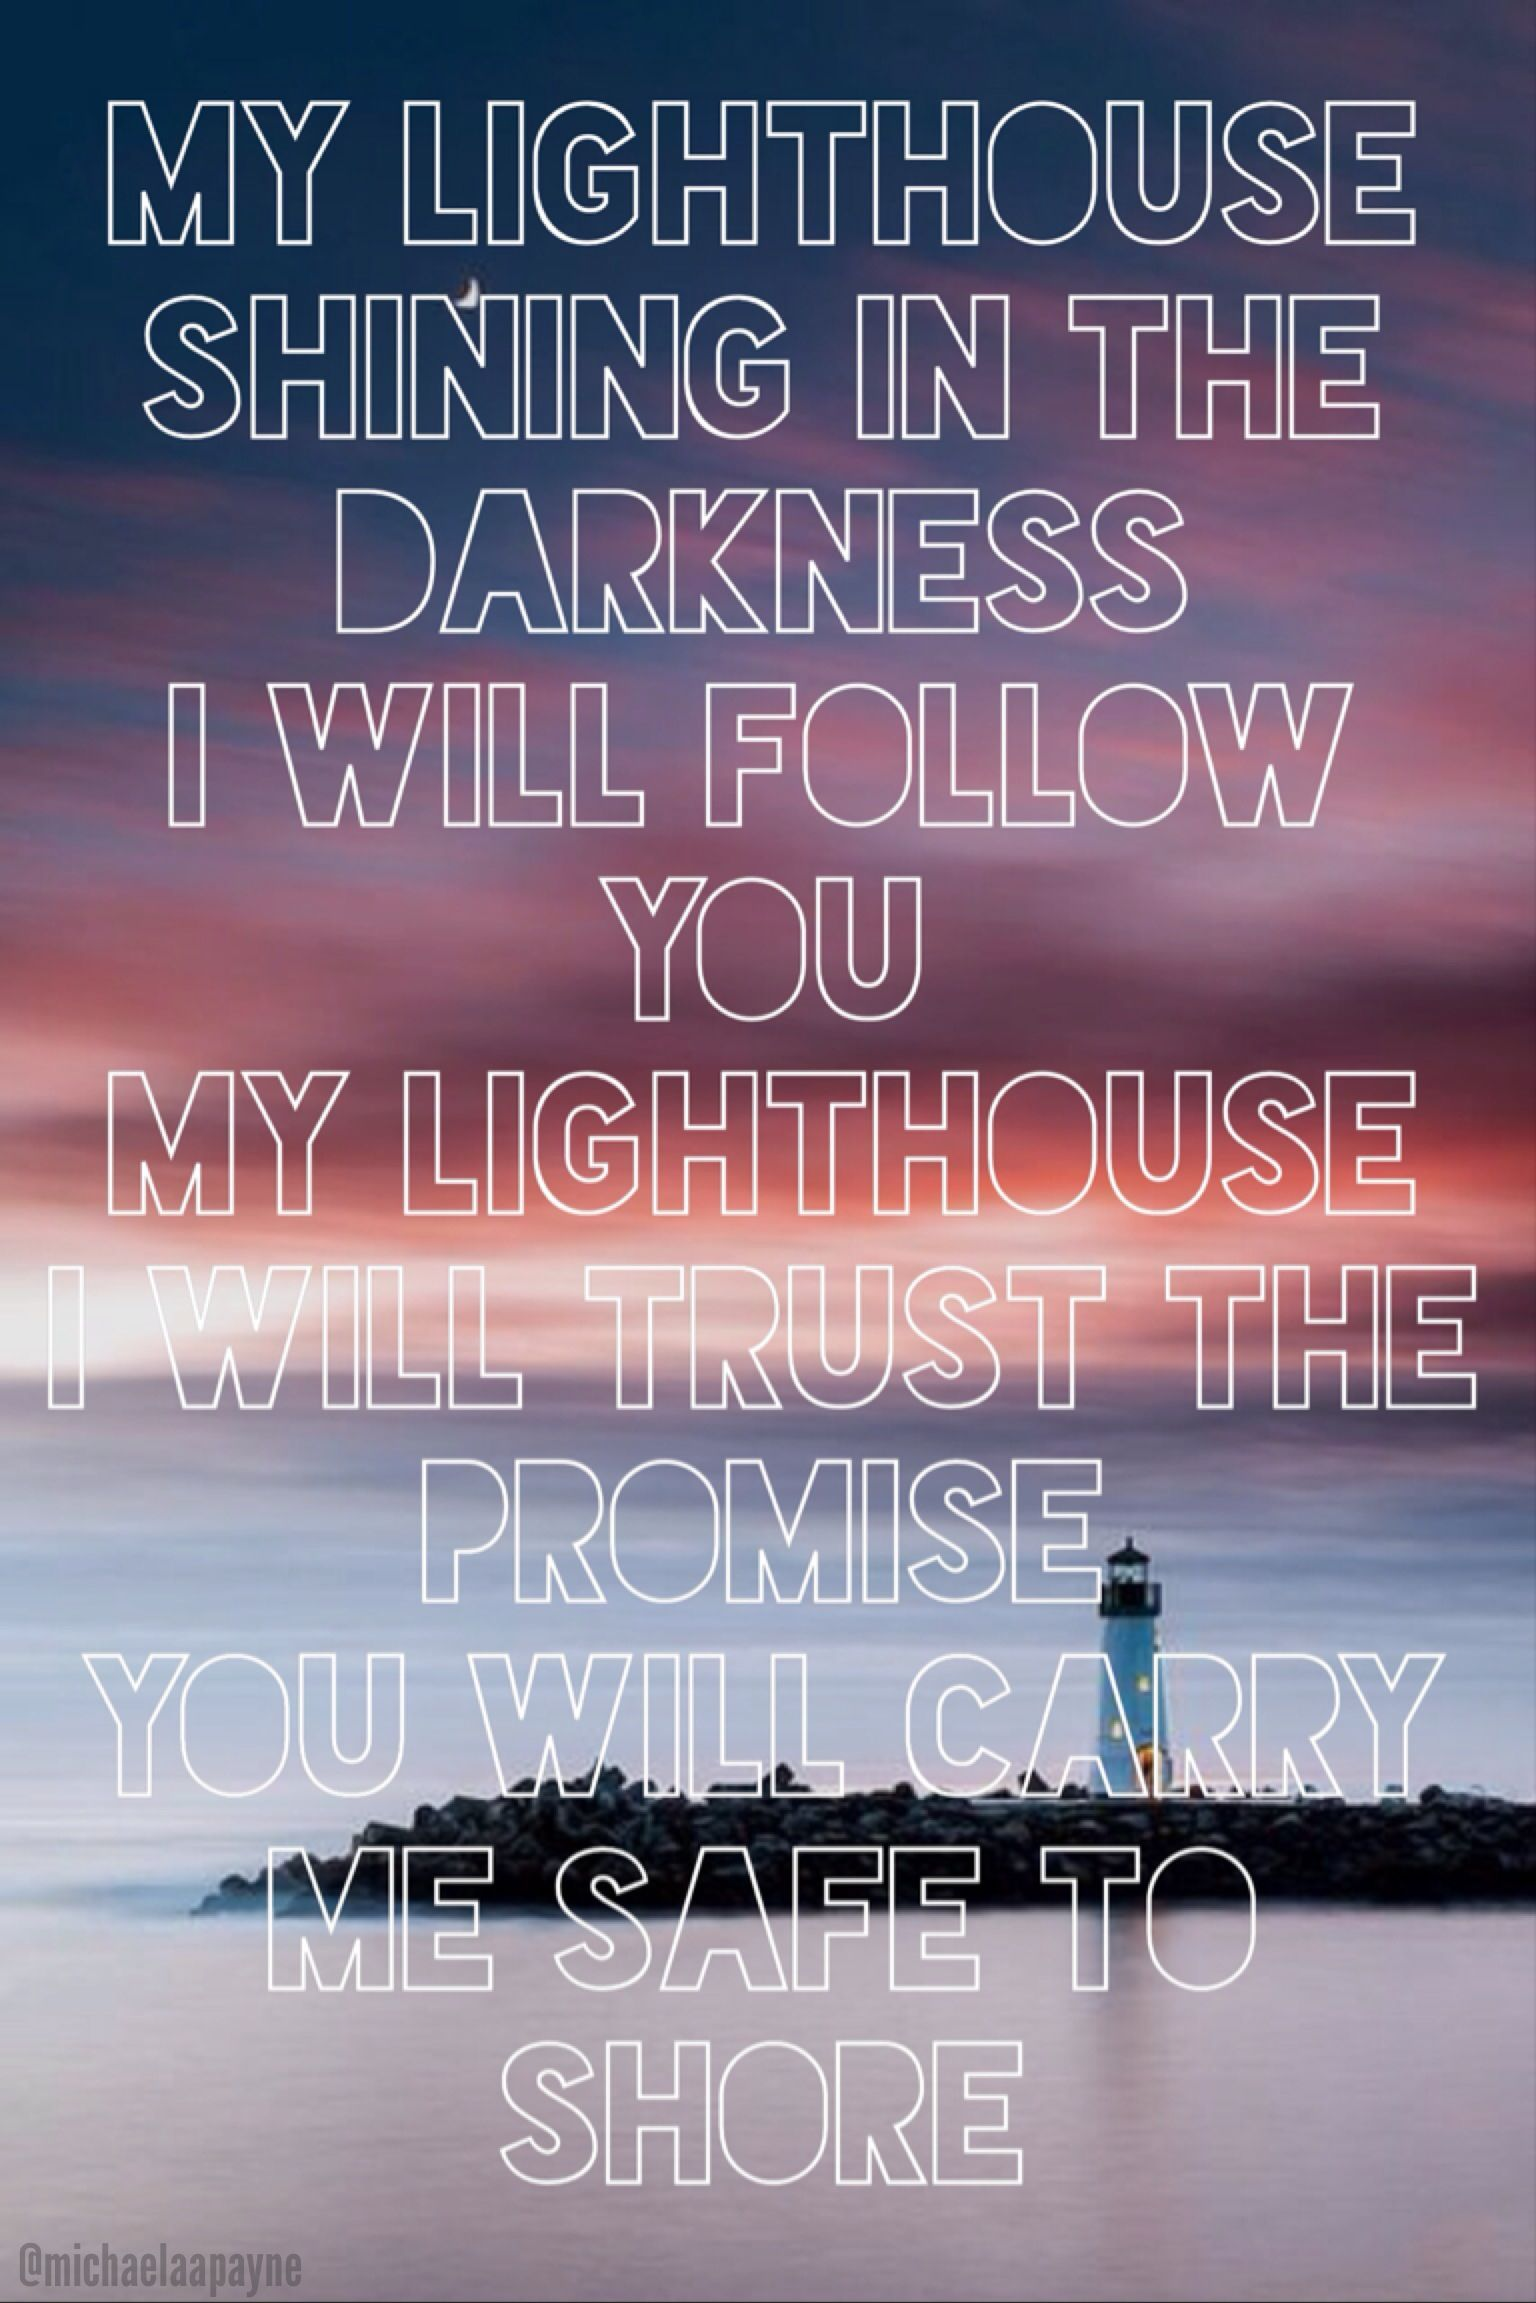 Westlife - Lighthouse Lyrics | MetroLyrics